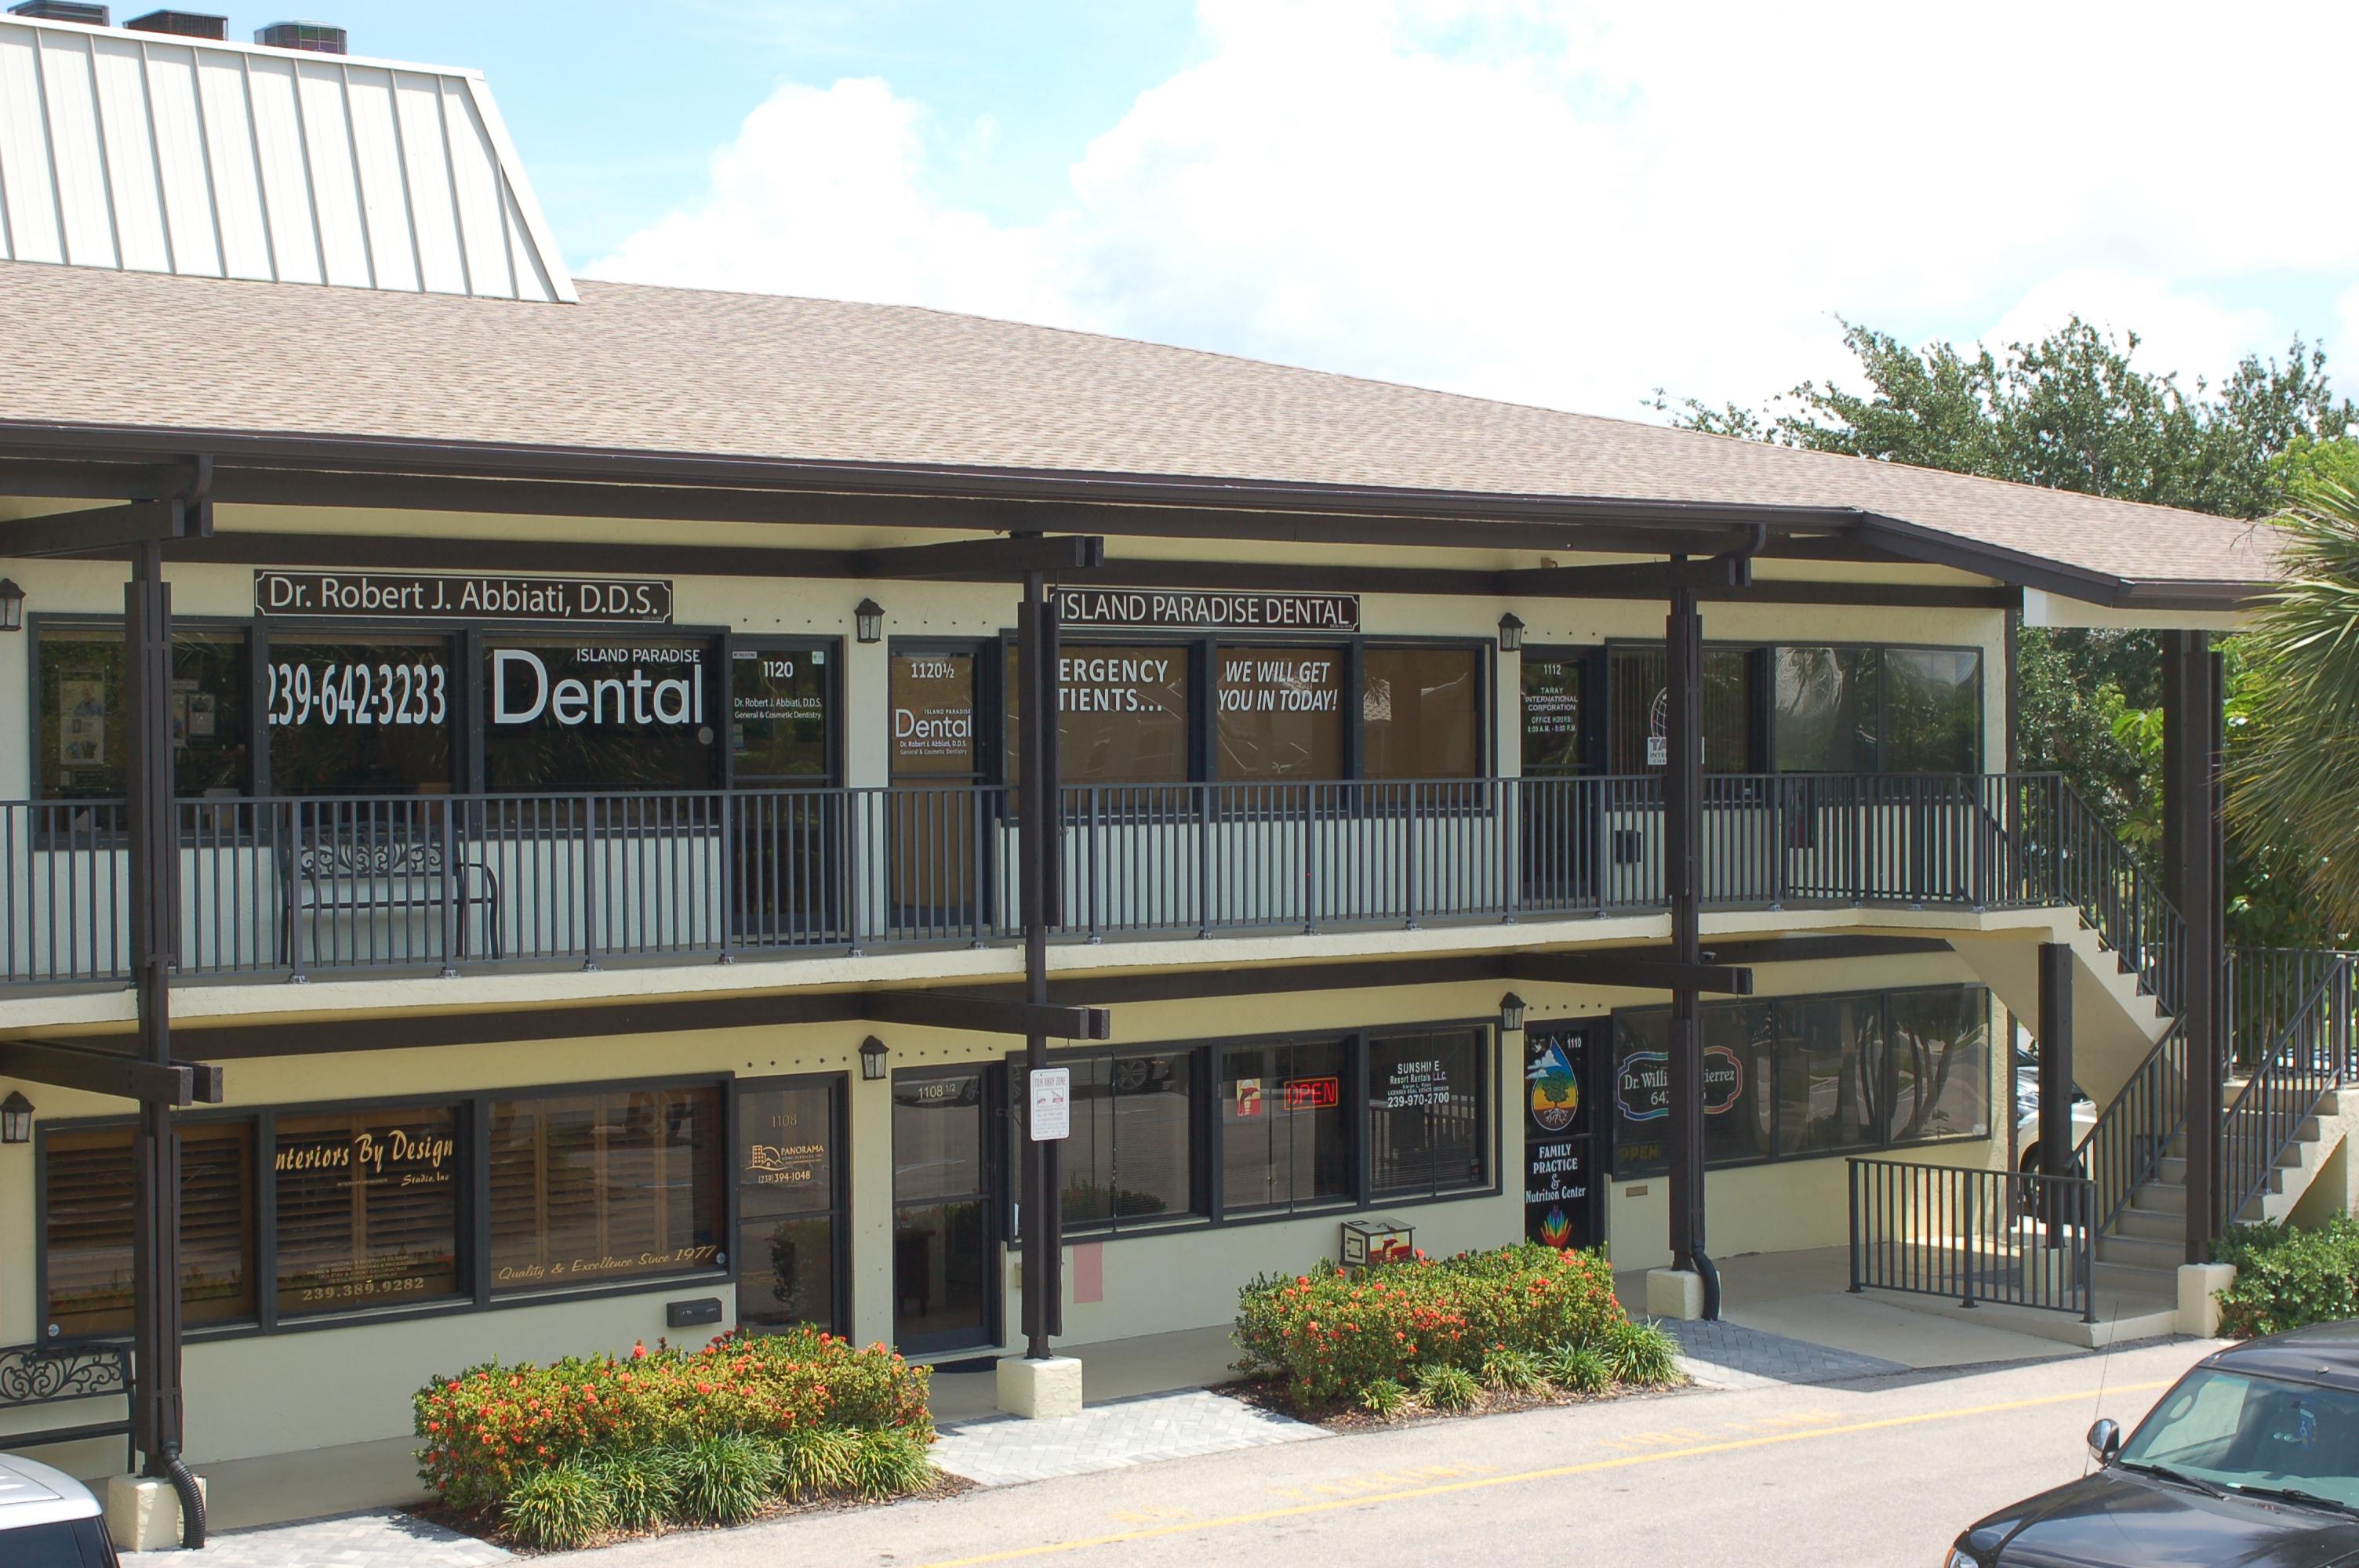 Island Paradise Dental, Dr. Robert J. Abbiati, DDS image 3